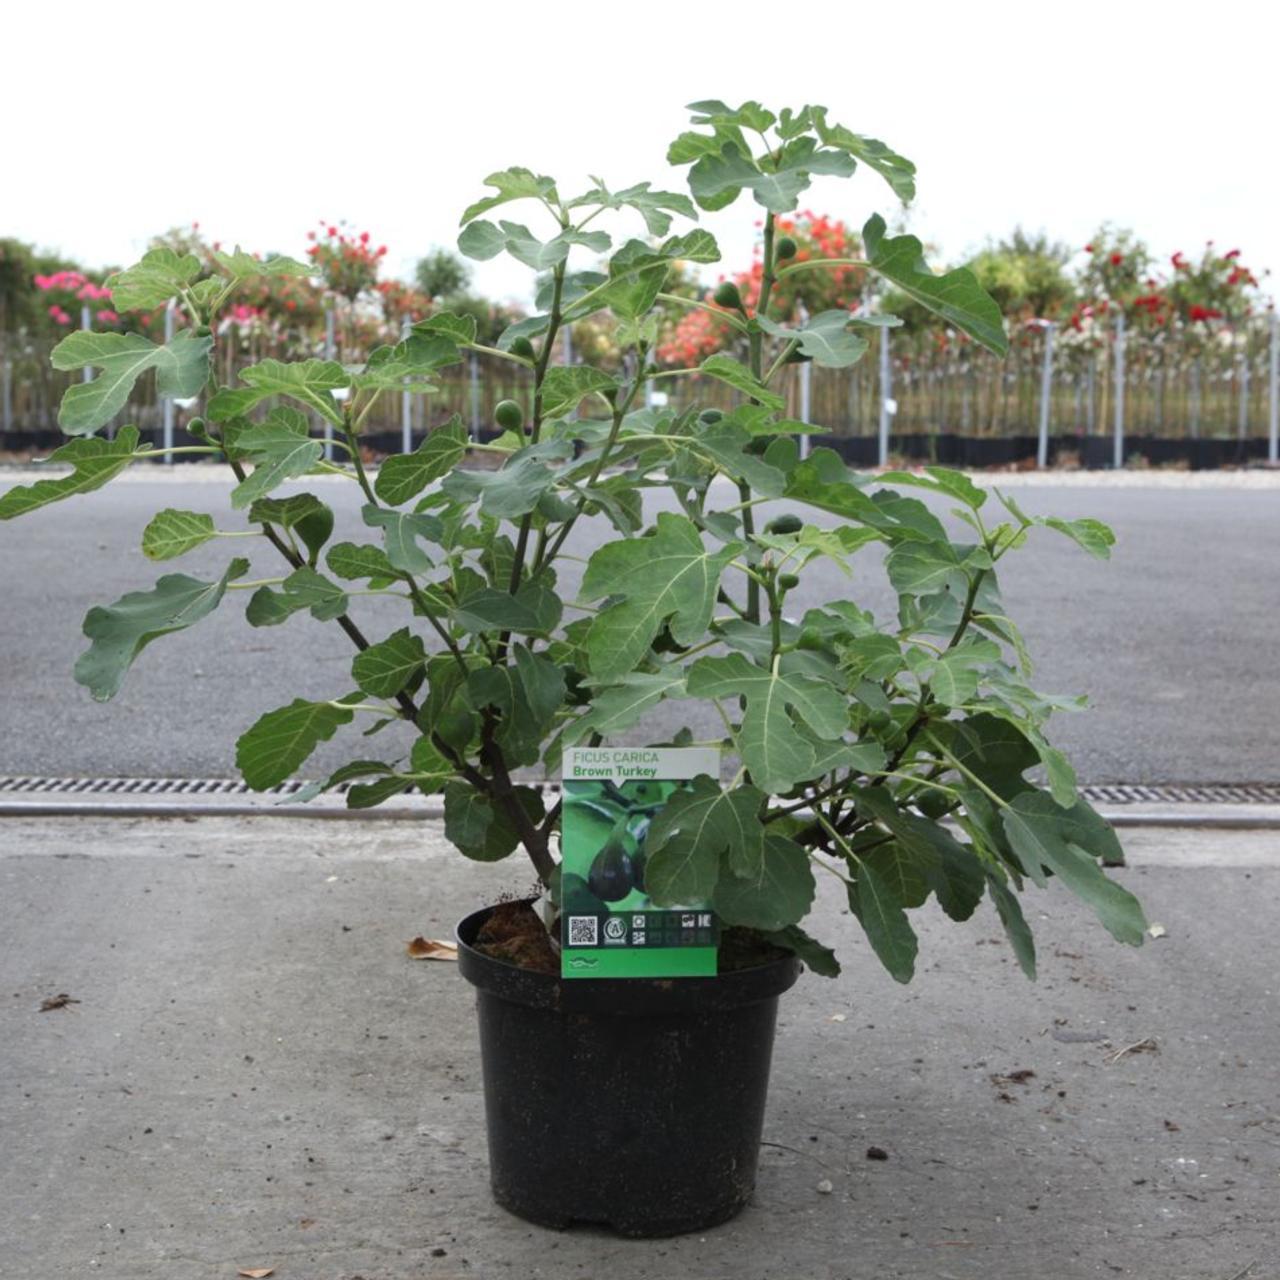 Ficus carica 'Brown Turkey' plant